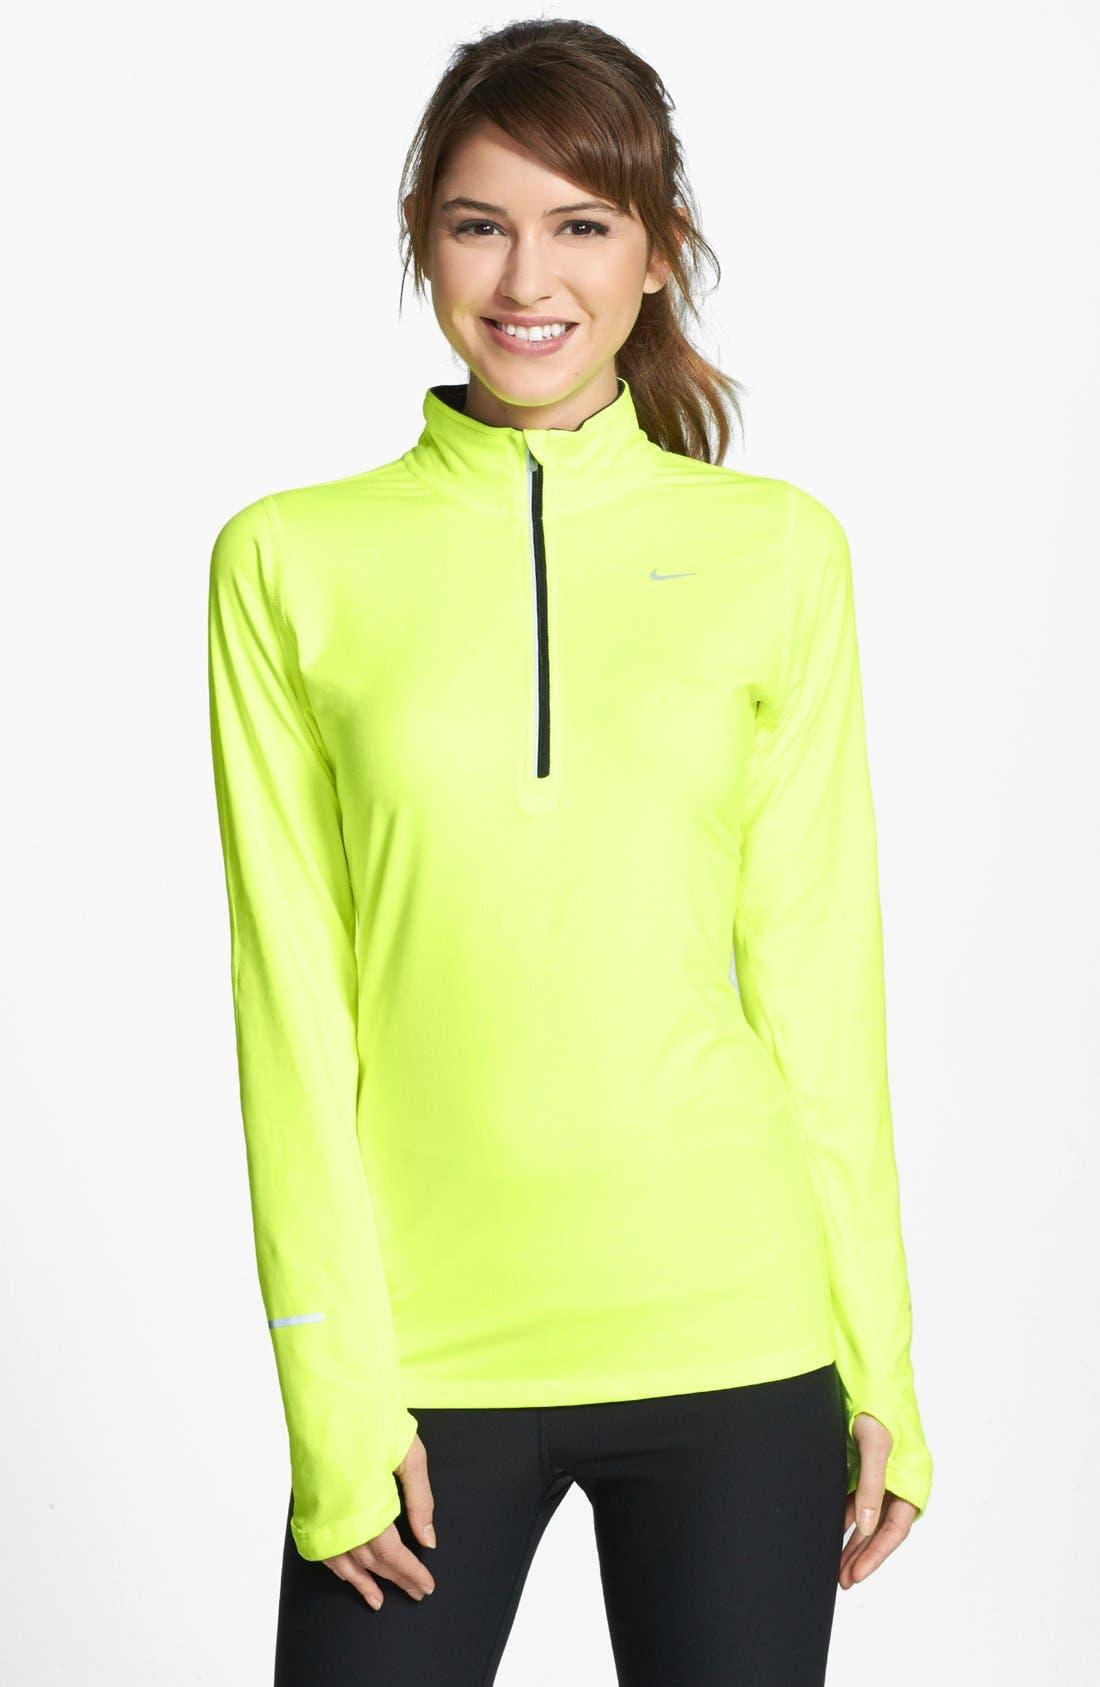 Alternate Image 1 Selected - Nike 'Element' Half Zip Top